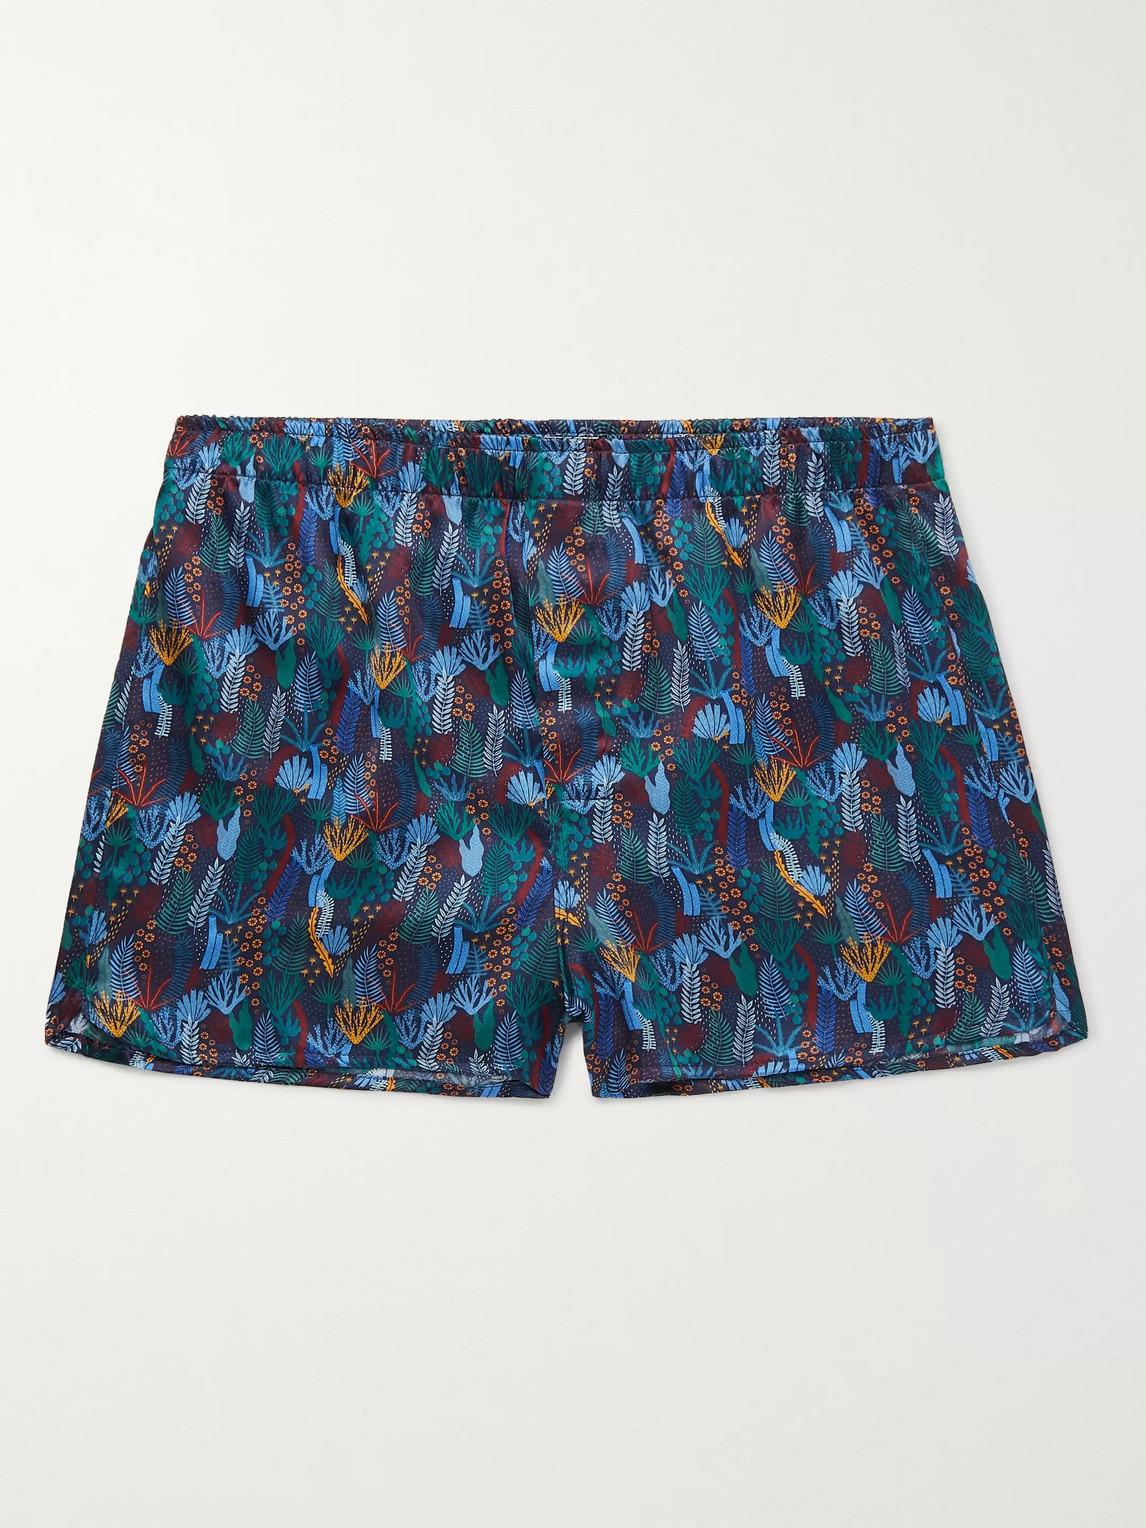 derek rose - brindisi printed silk boxer shorts - blue - s - men